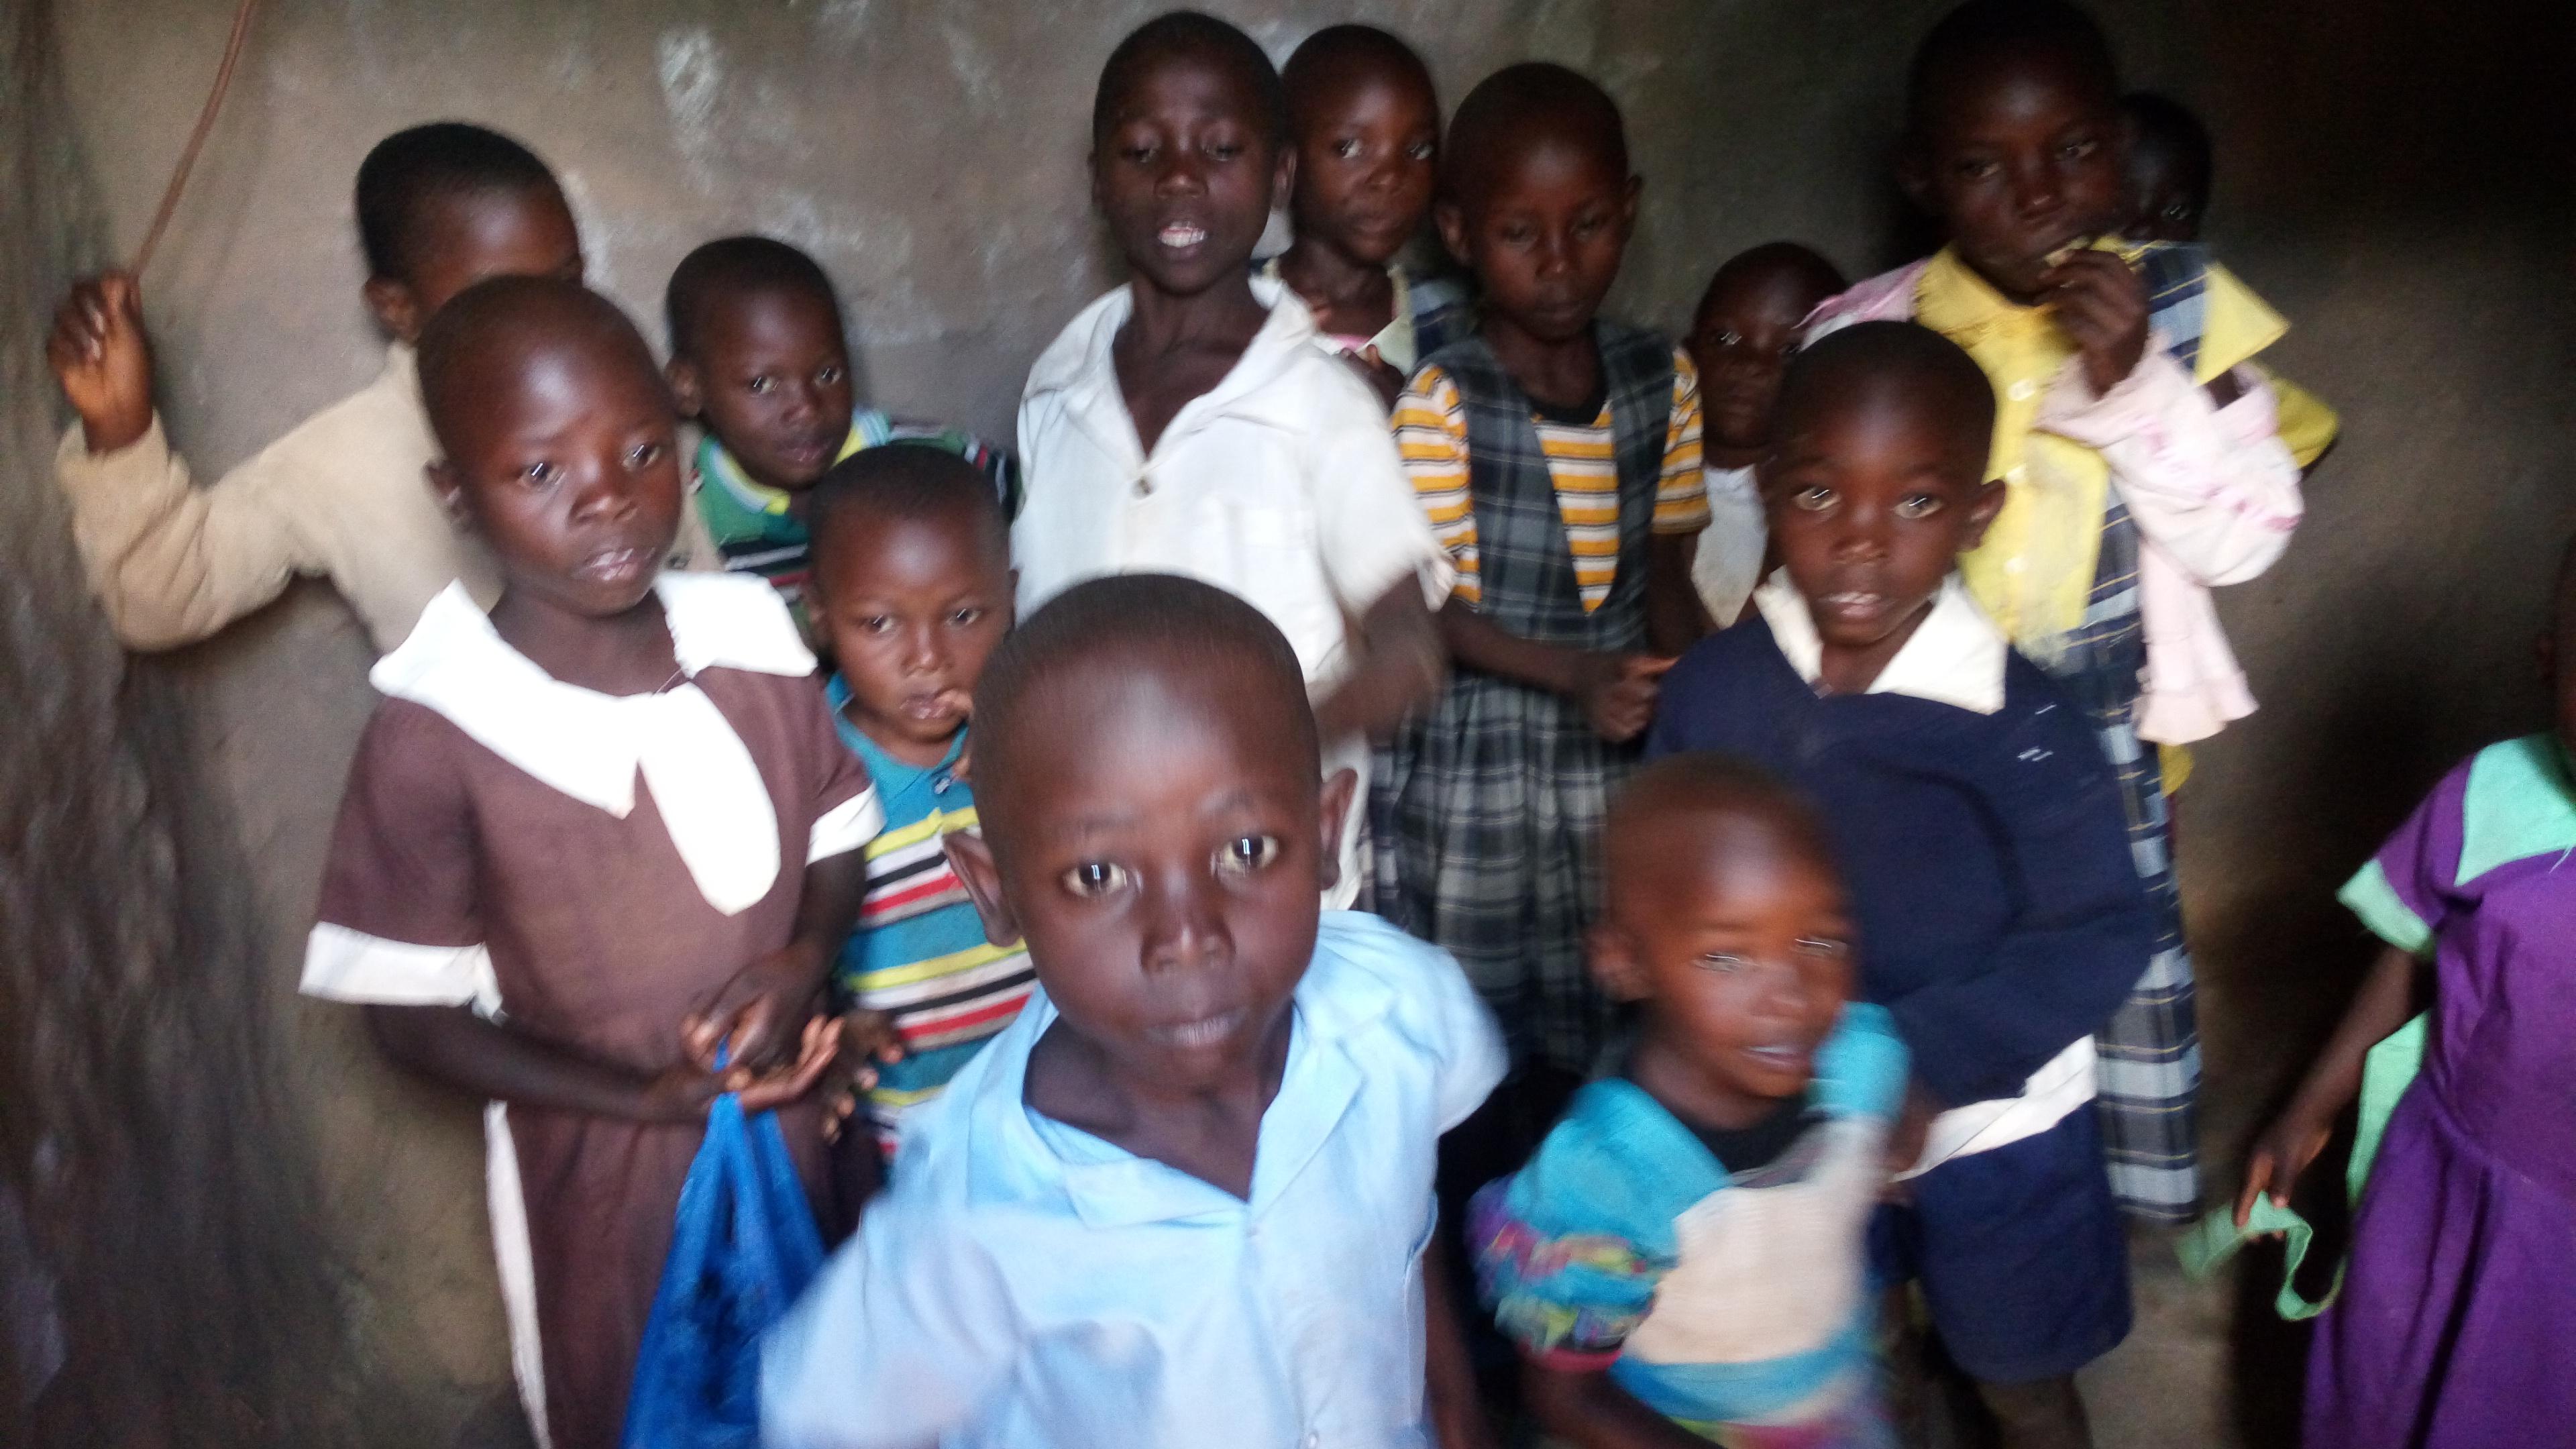 KAMUKUYWA MISSION SCHOOL & ORPHANAGE